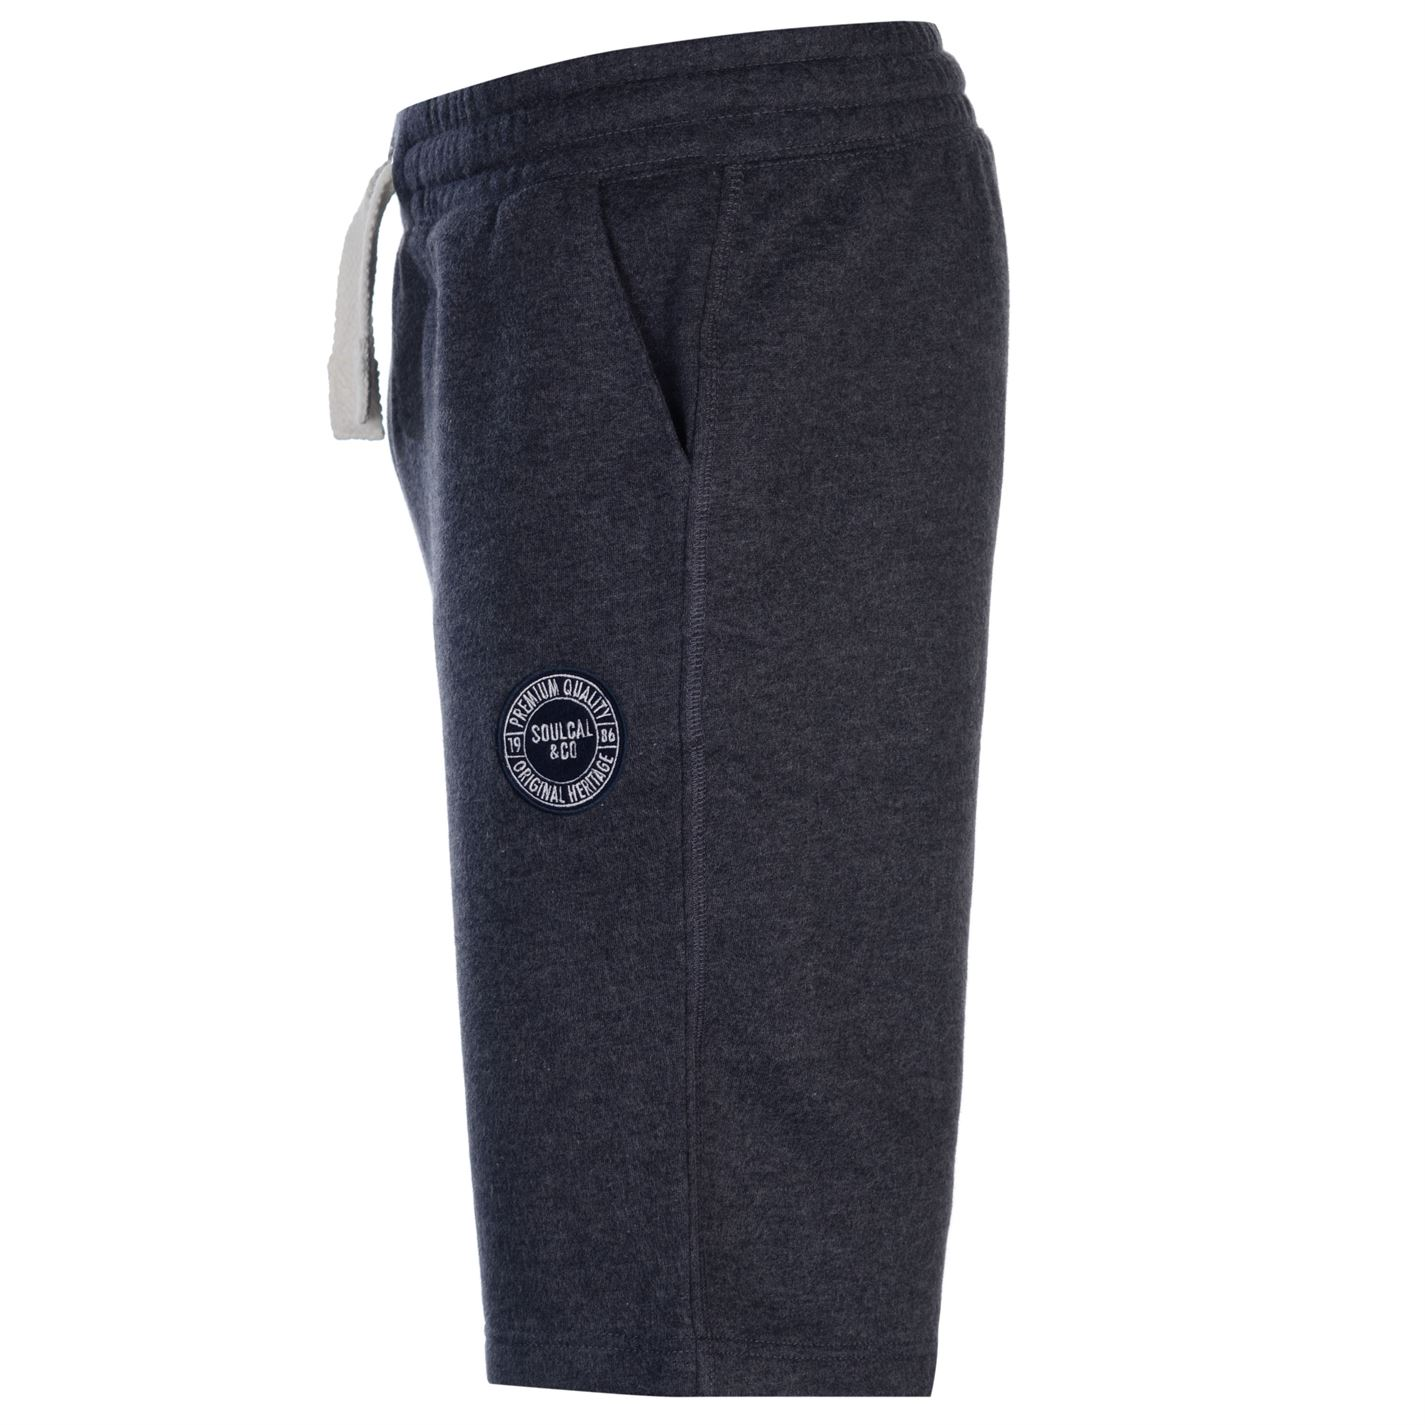 SoulCal Cal sigflc Shrt Uomo Gents In Pile Pantaloncini Pants Pantaloni Bottoms